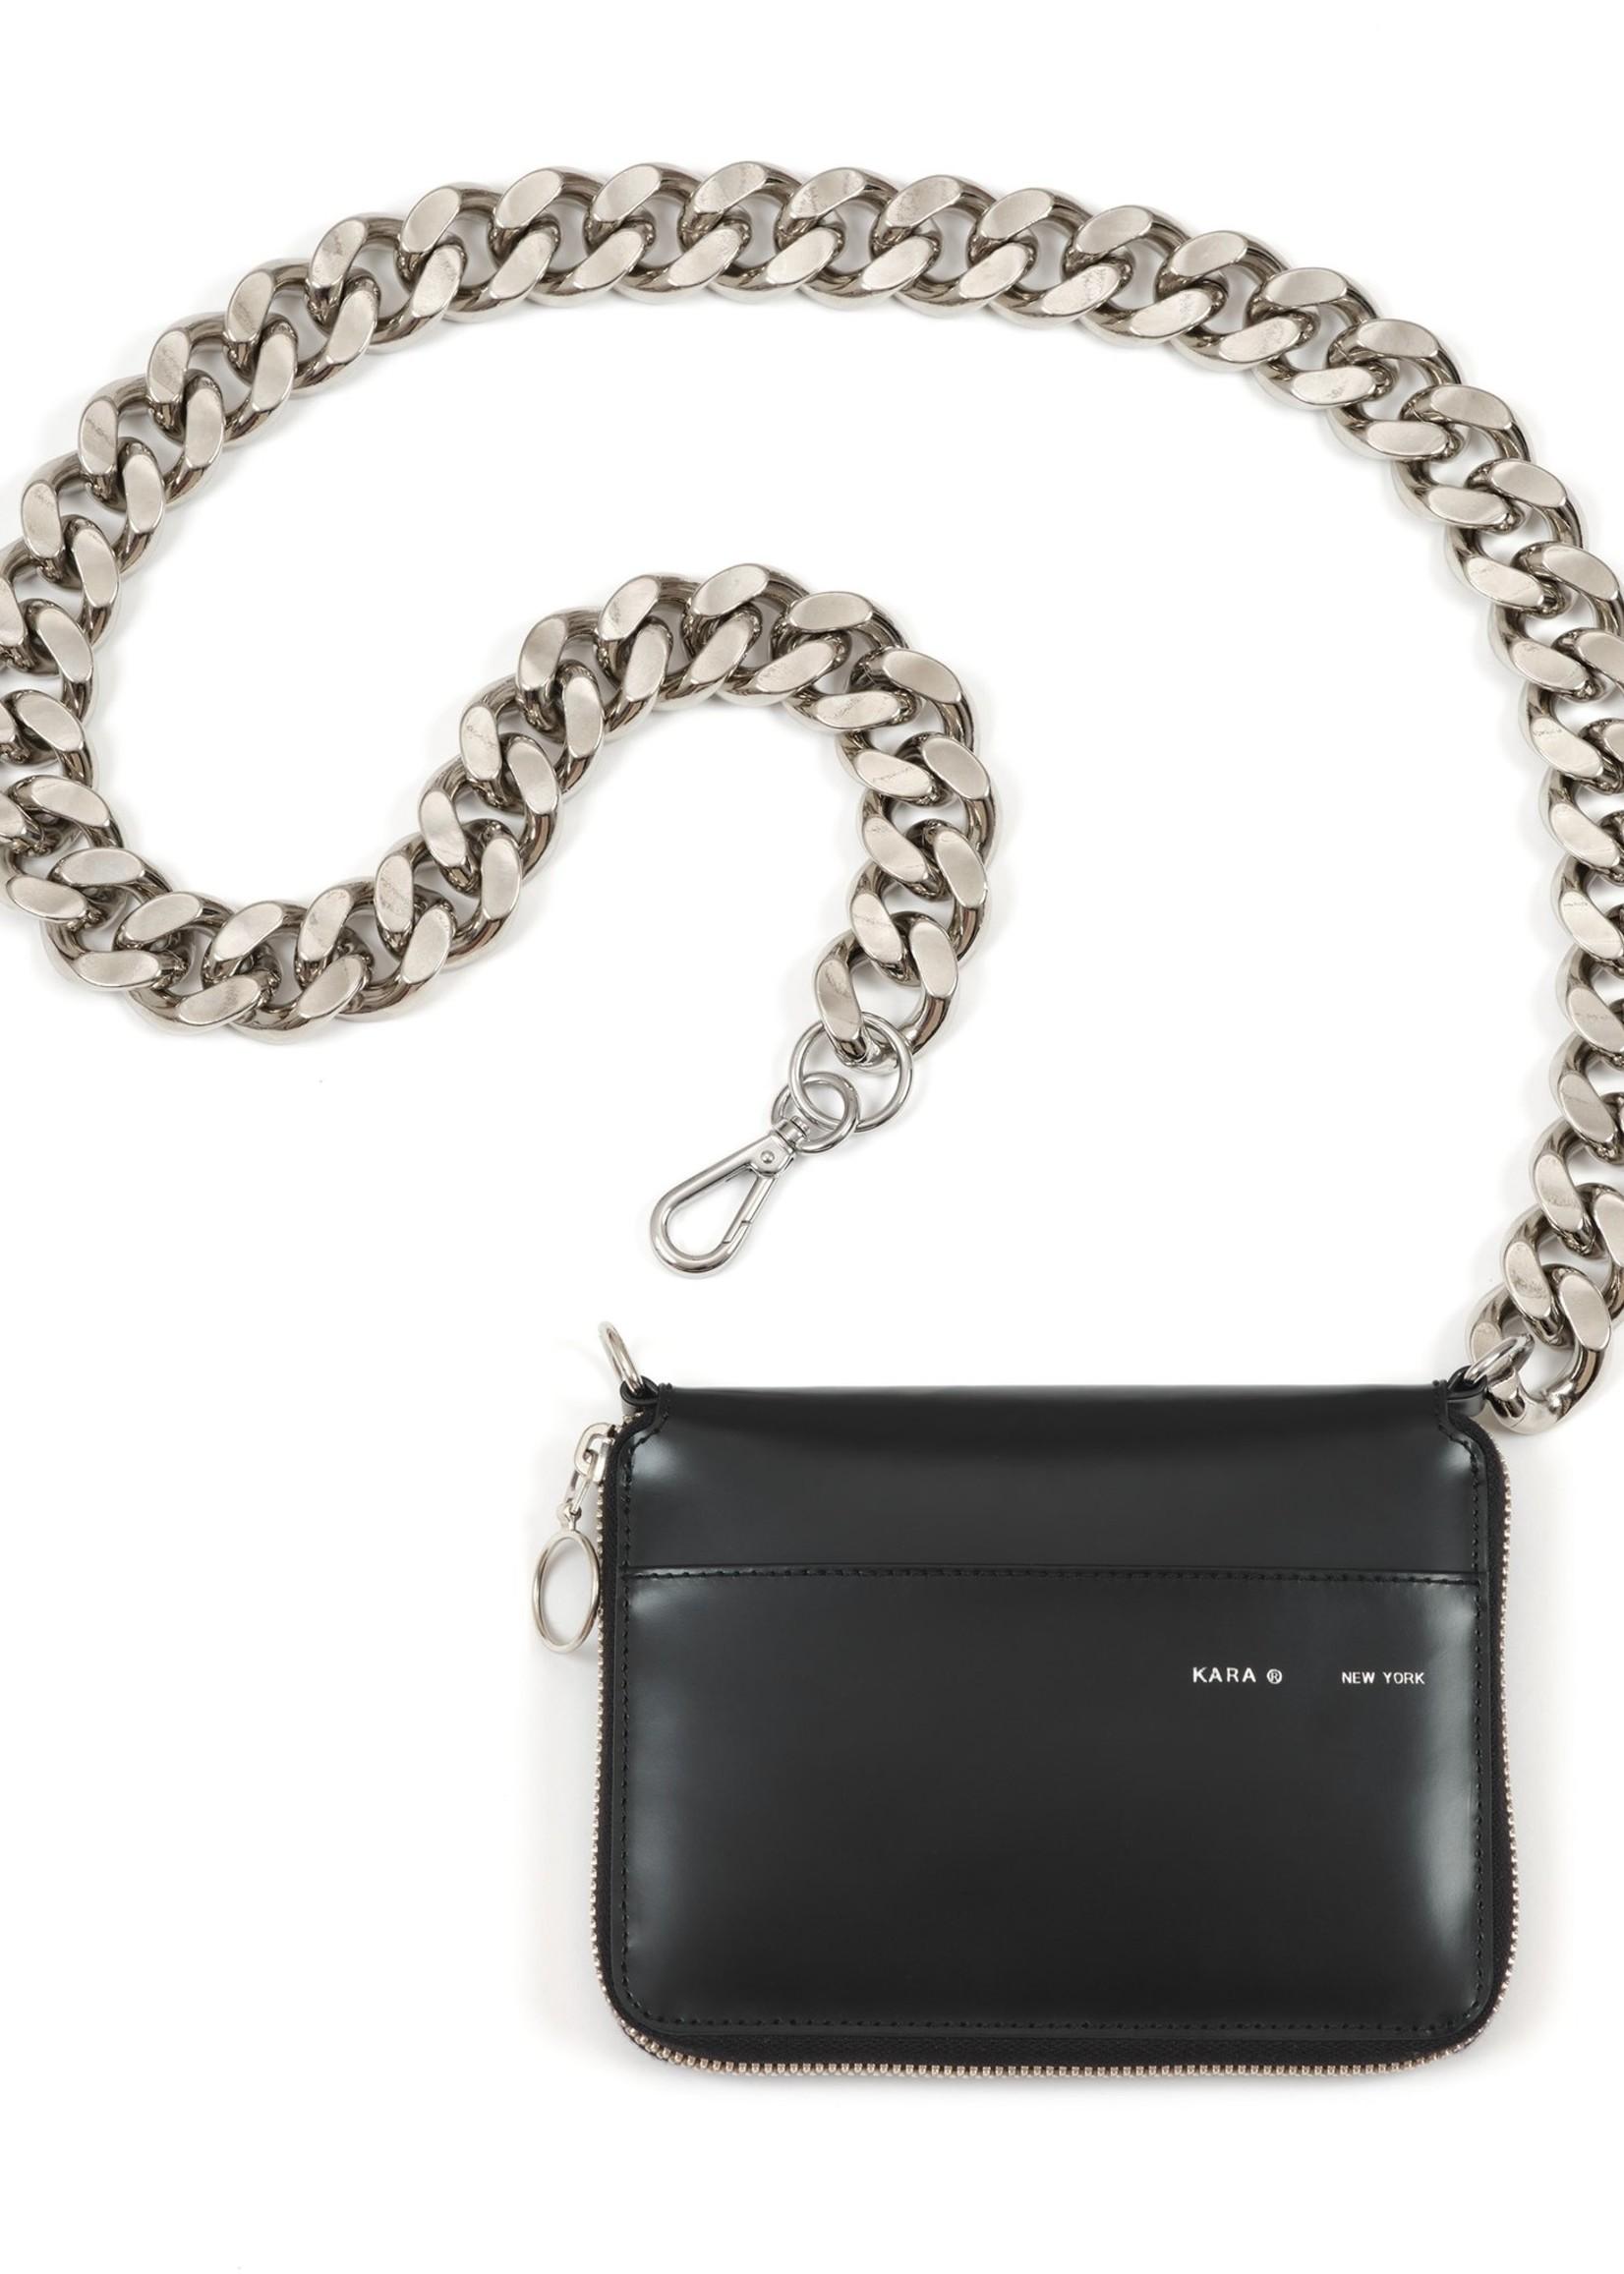 KARA Large Bike Chain Wallet in Black